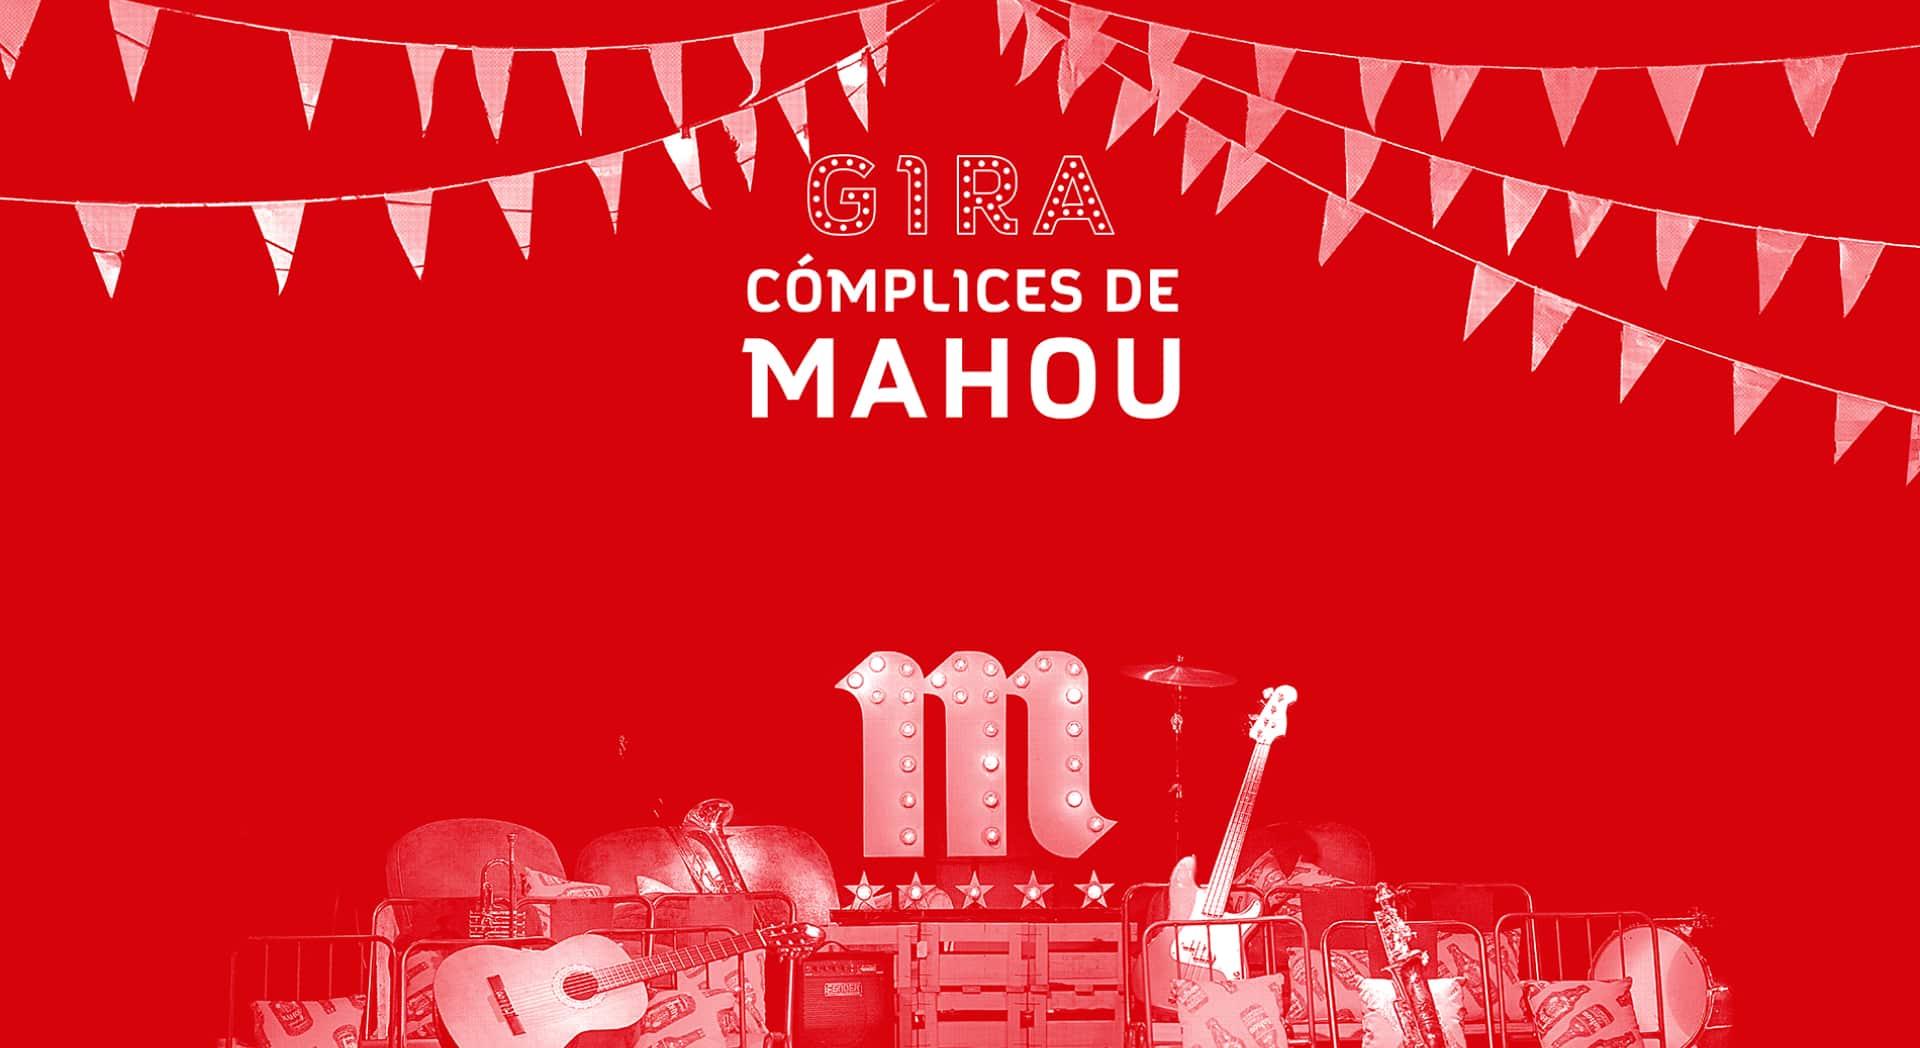 impresion-grafica-gran-formato-evento-complices-de-mahou